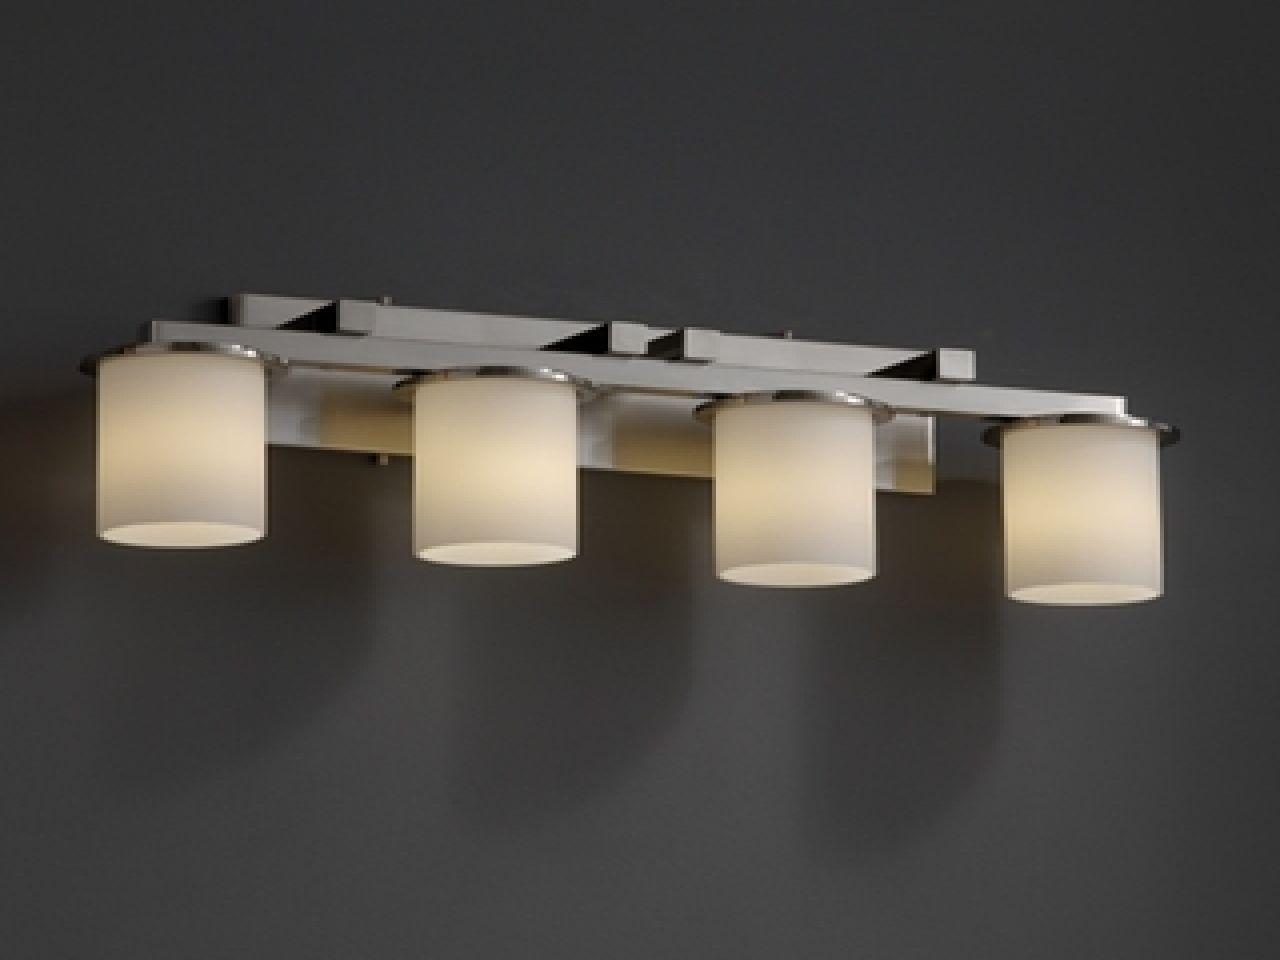 Versatile Bathroom Light Fixtures Brushed Nickel for Your House ...